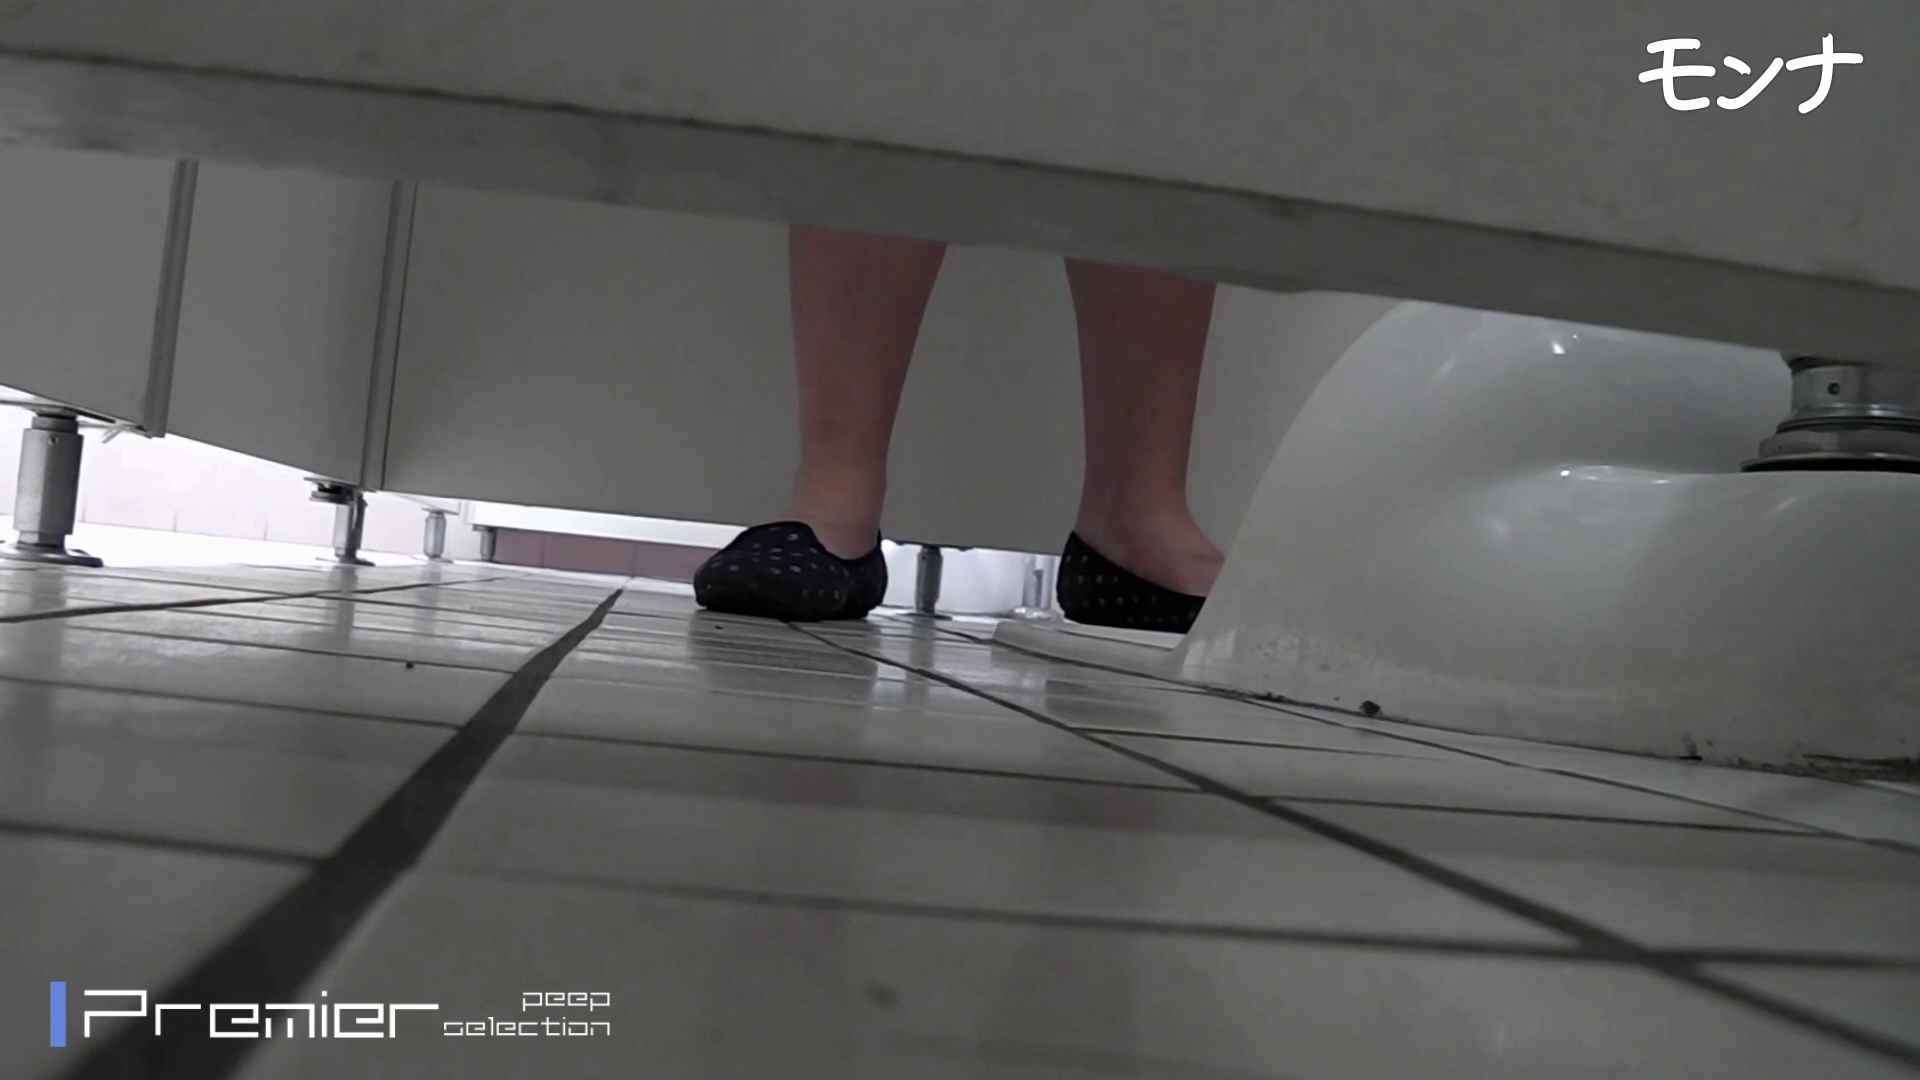 CM 悶絶シリーズ5 【美しい日本の未来 No.128】 洗面所のぞき オメコ動画キャプチャ 111枚 47